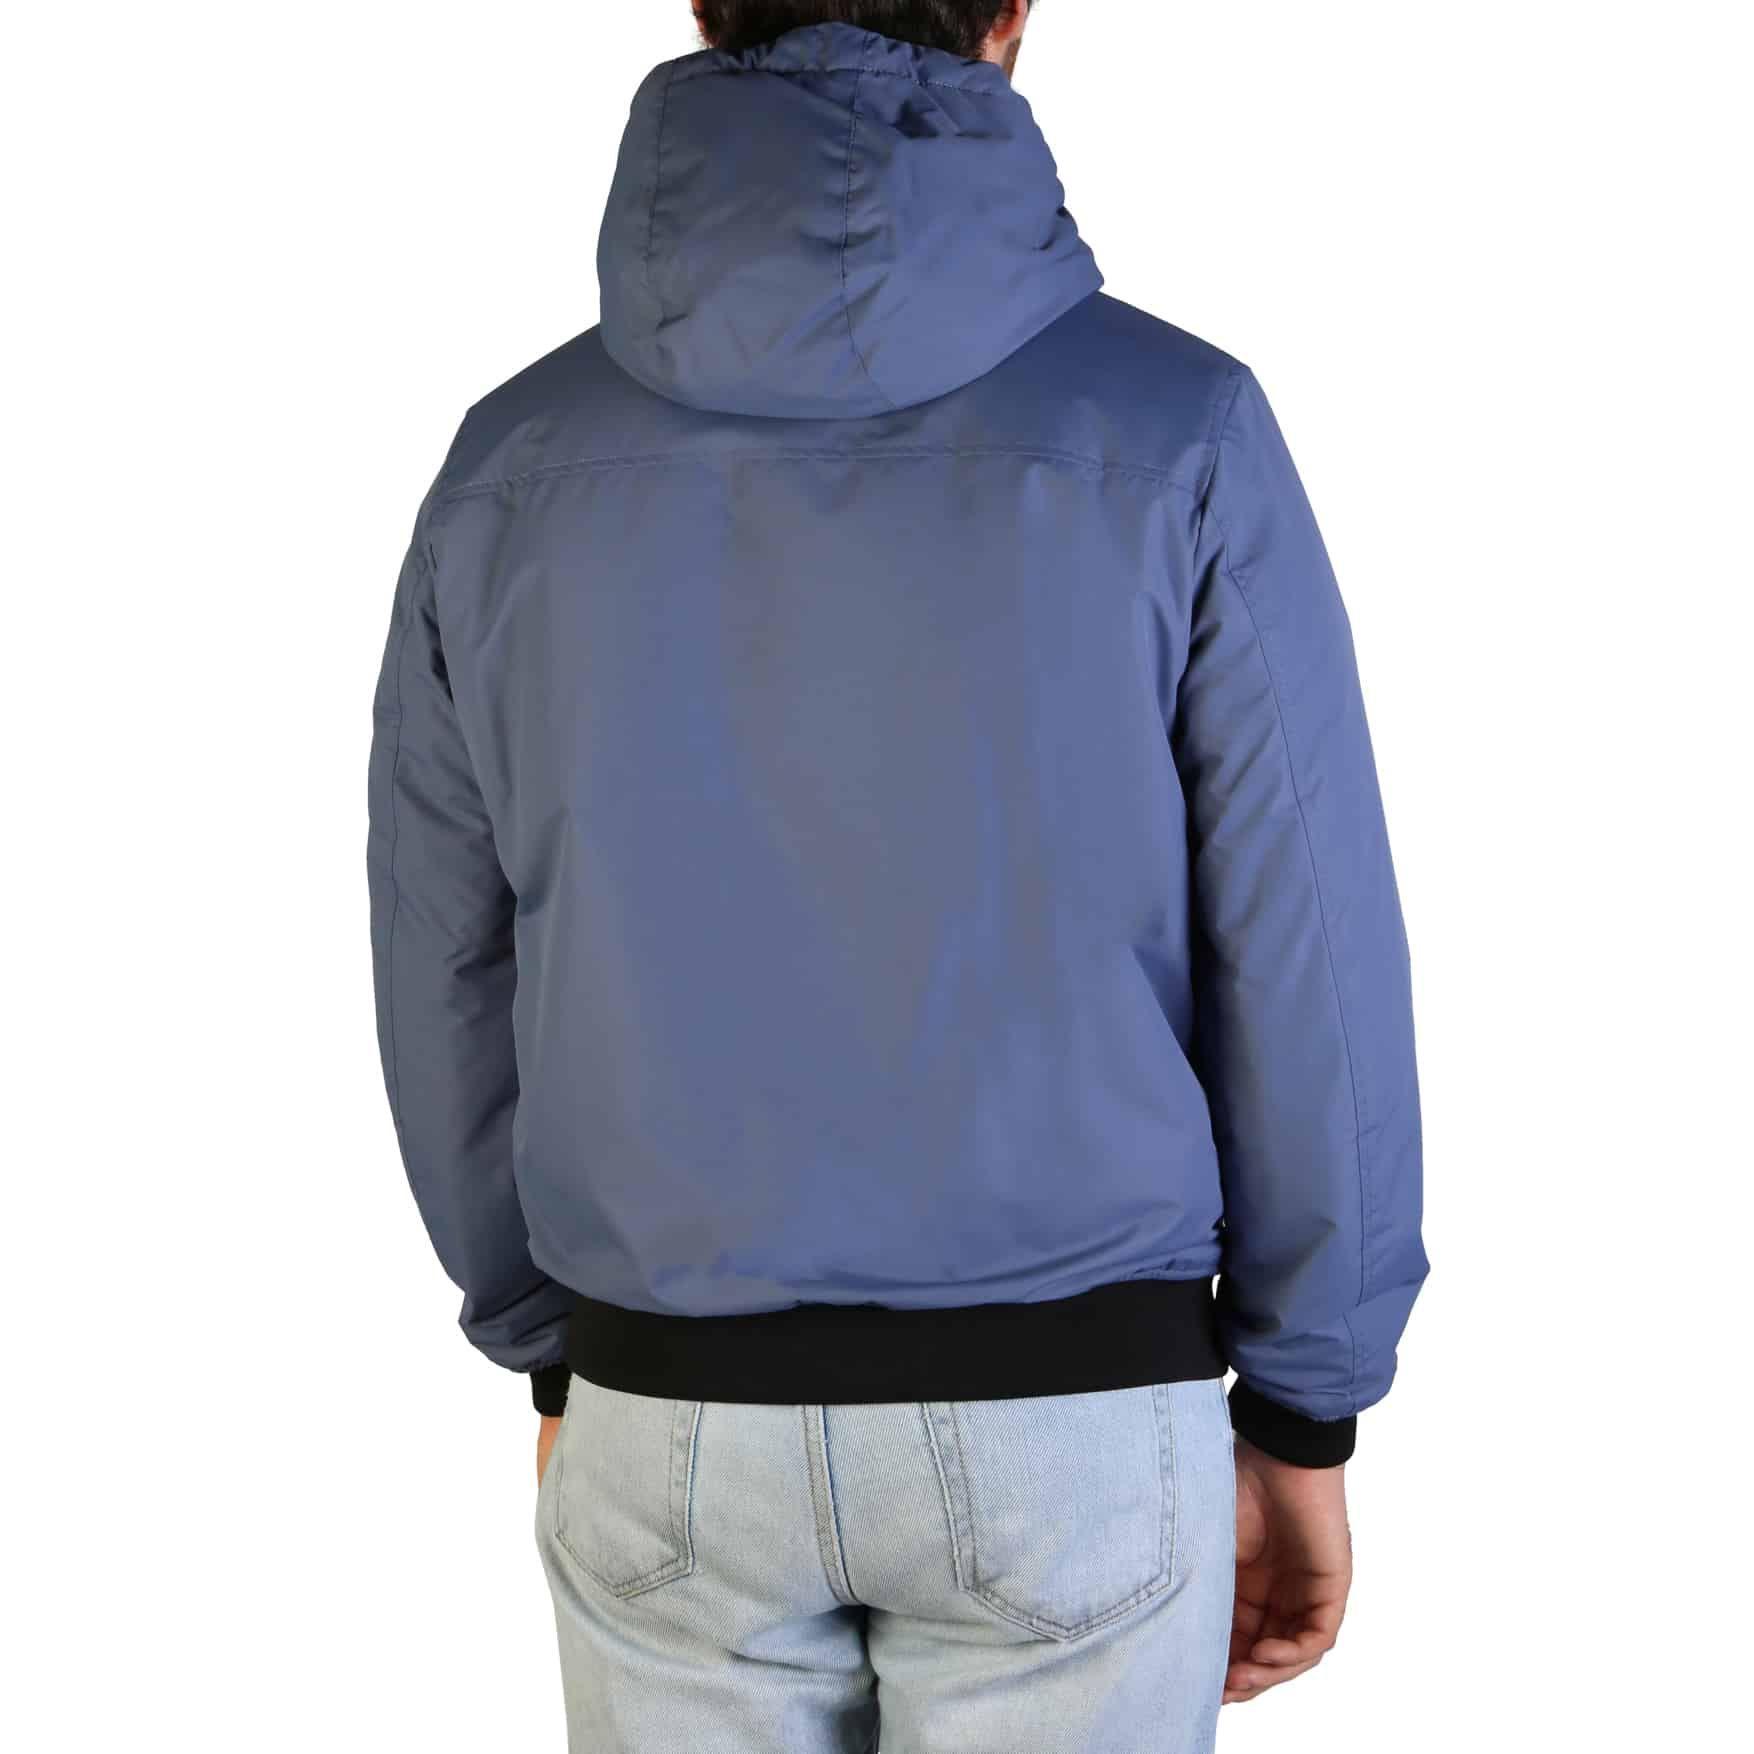 Vestes Refrigue – TEHO-A